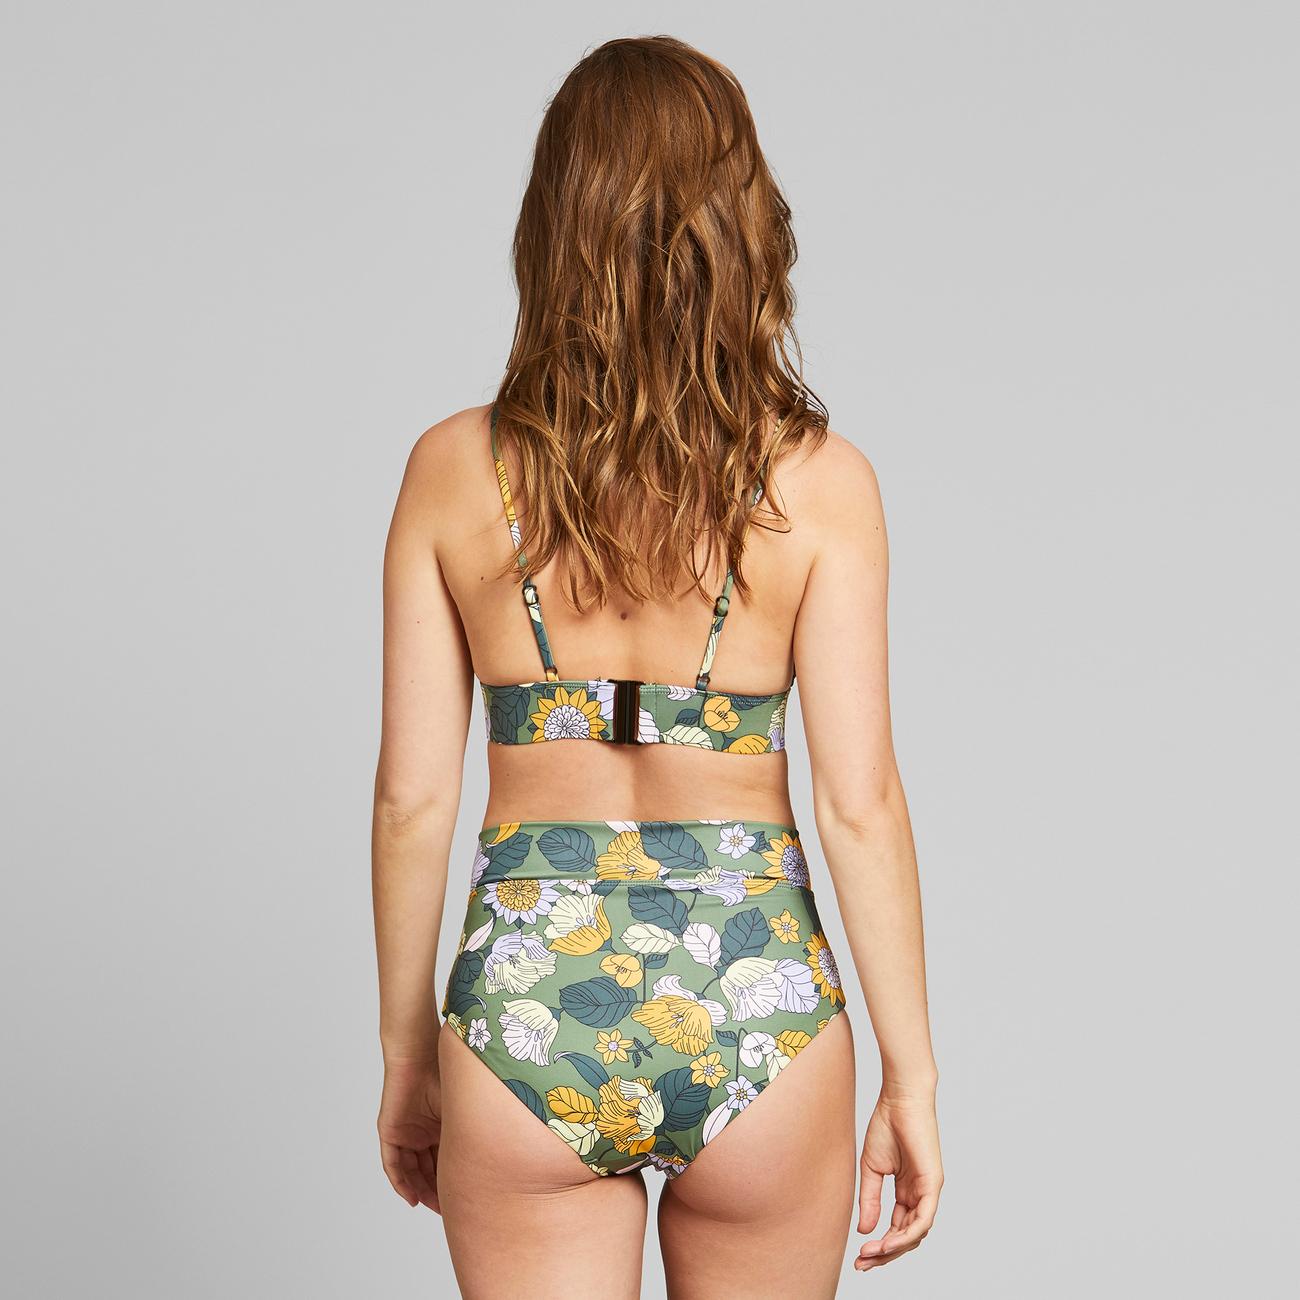 Bikini Pants Slite Seventies Floral Green